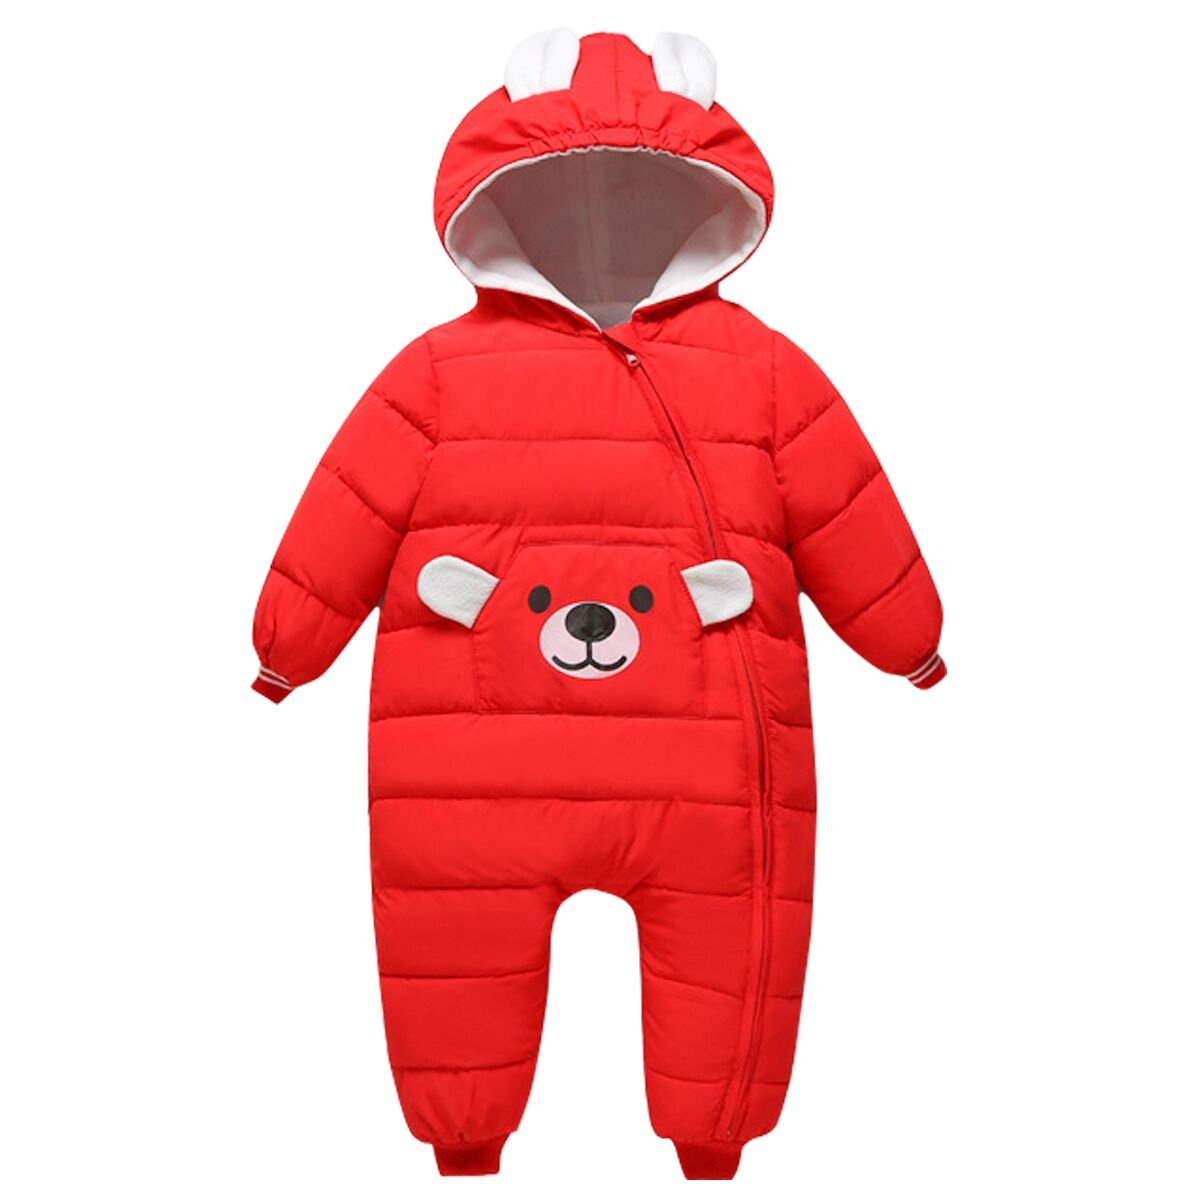 Bebone Baby Girls Boys Cartoon Hooded Winter Snowsuit